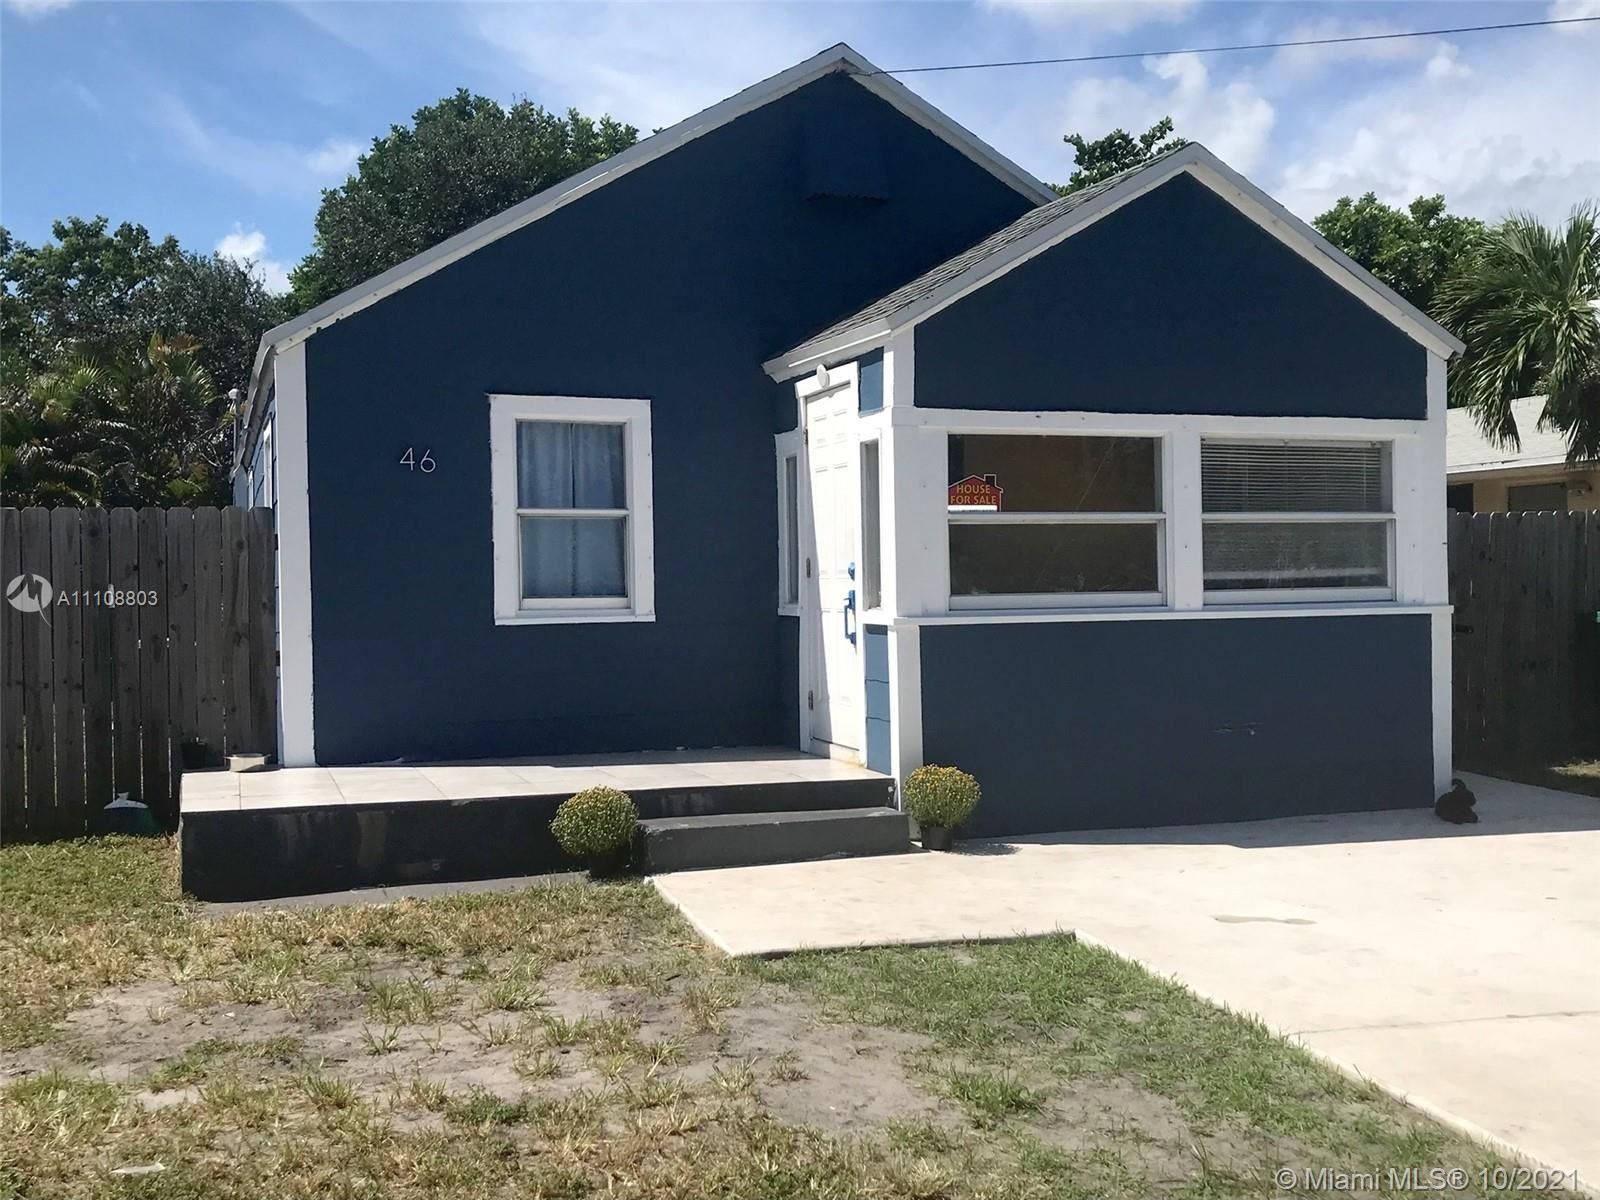 Photo of 46 SW 7th Ave, Dania Beach, FL 33004 (MLS # A11108803)